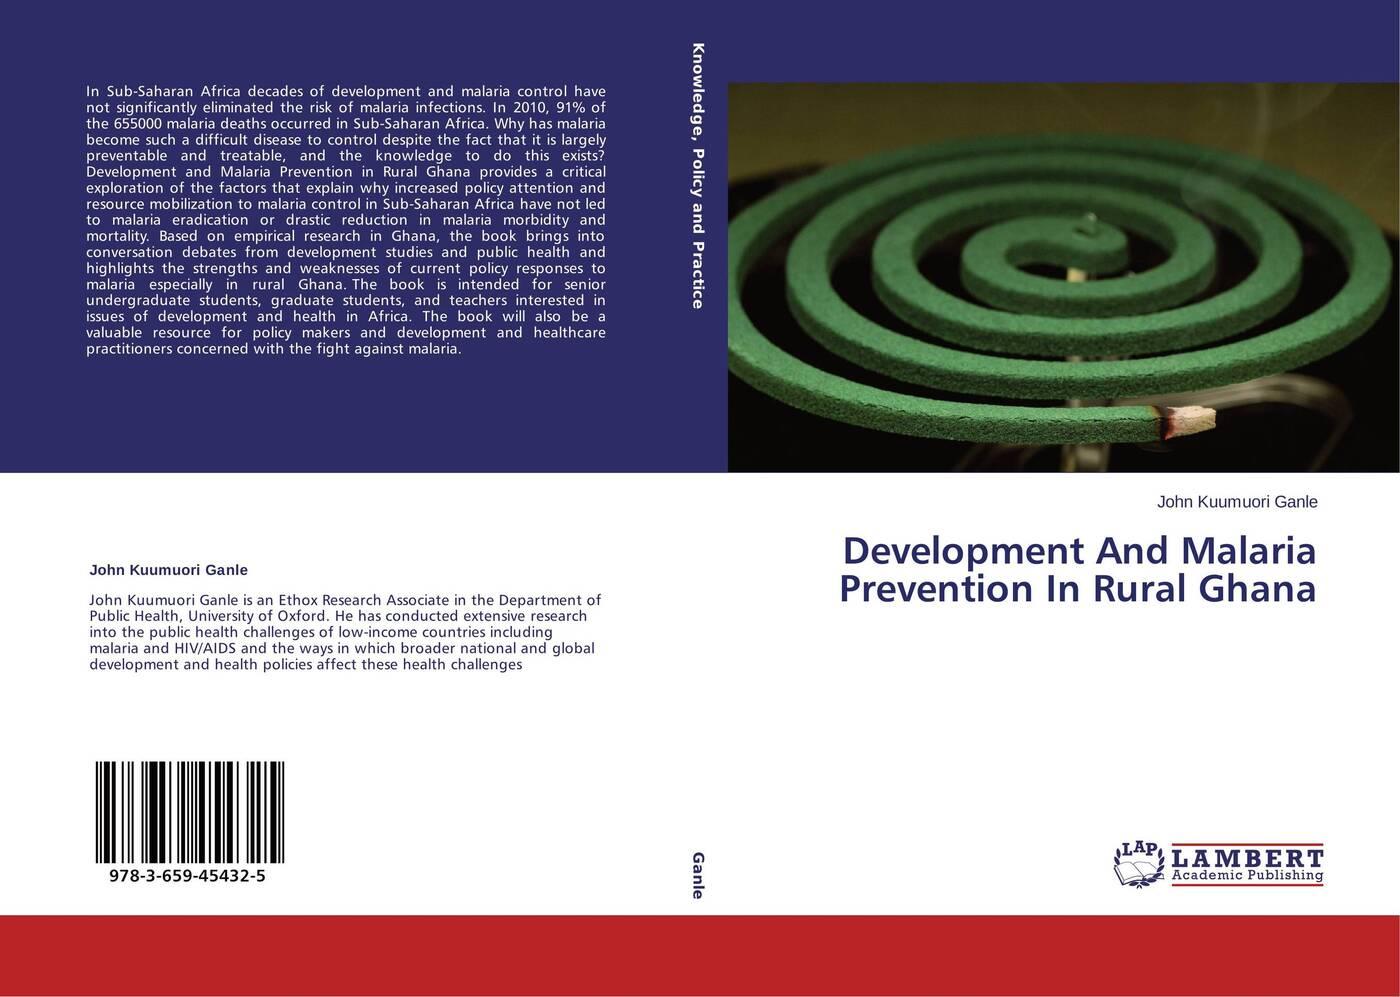 John Kuumuori Ganle Development And Malaria Prevention In Rural Ghana persistence of poverty in rural ghana